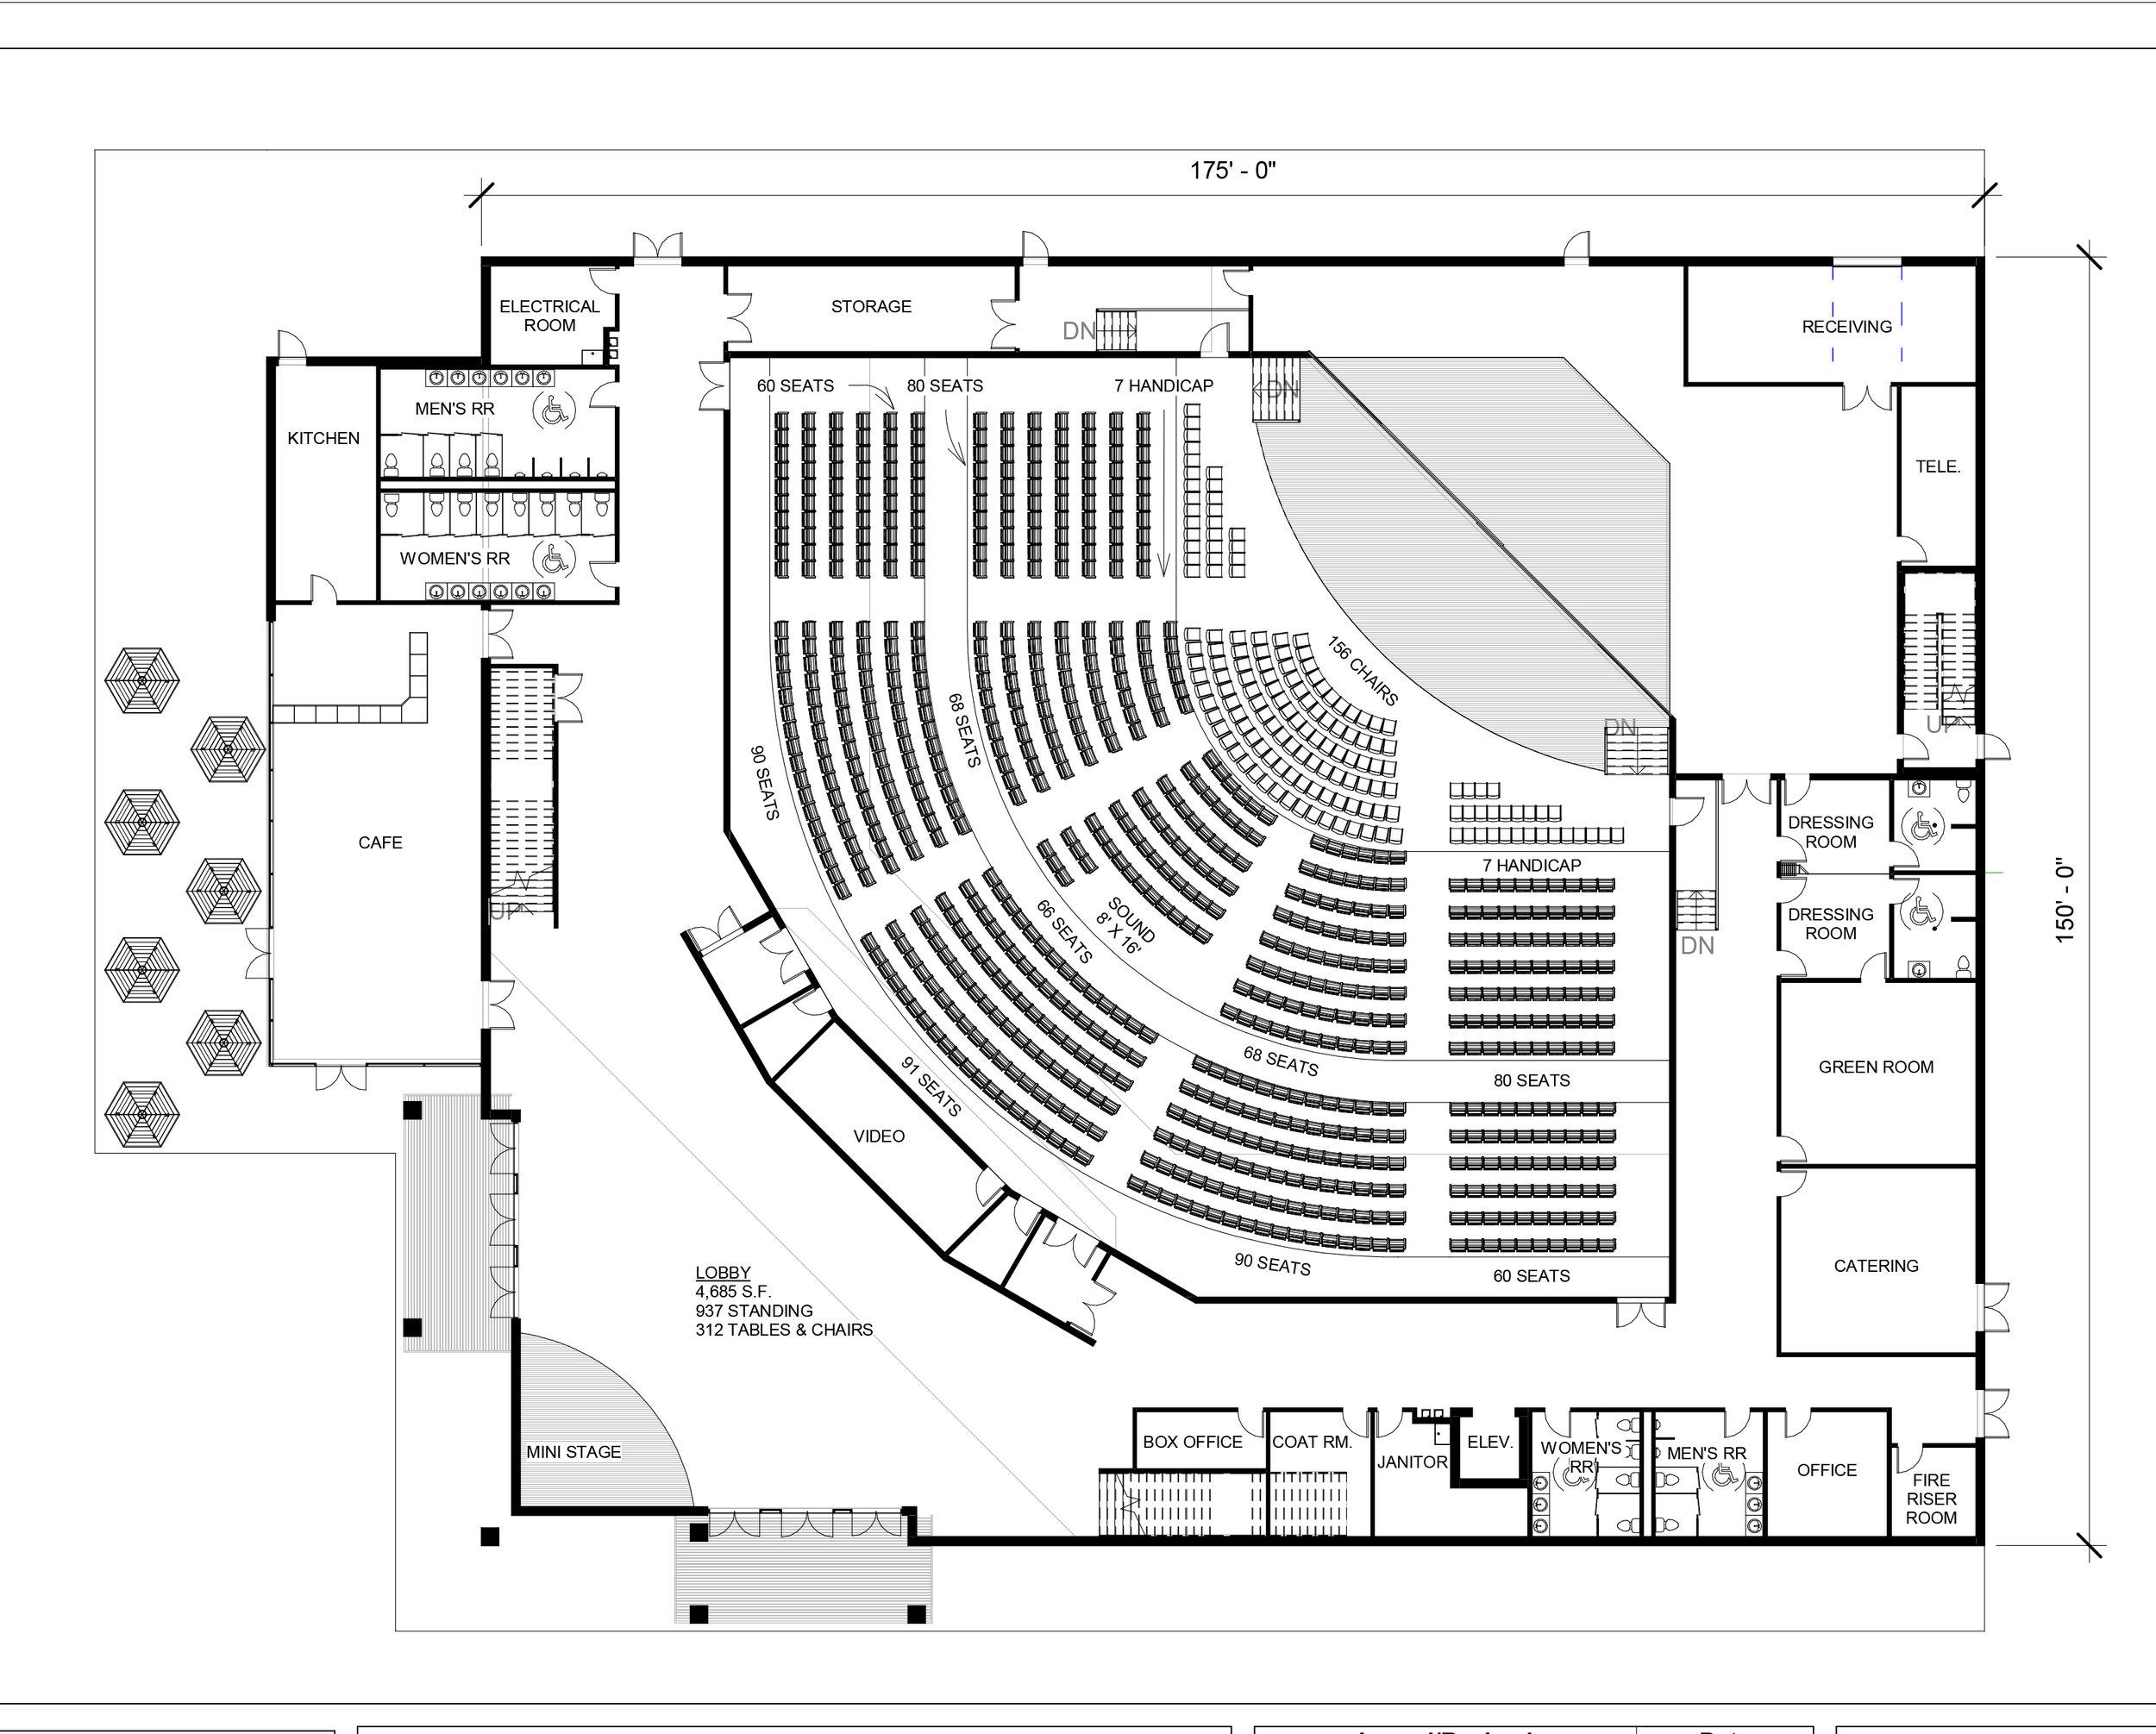 3-12-19 First Floor cropped.jpg